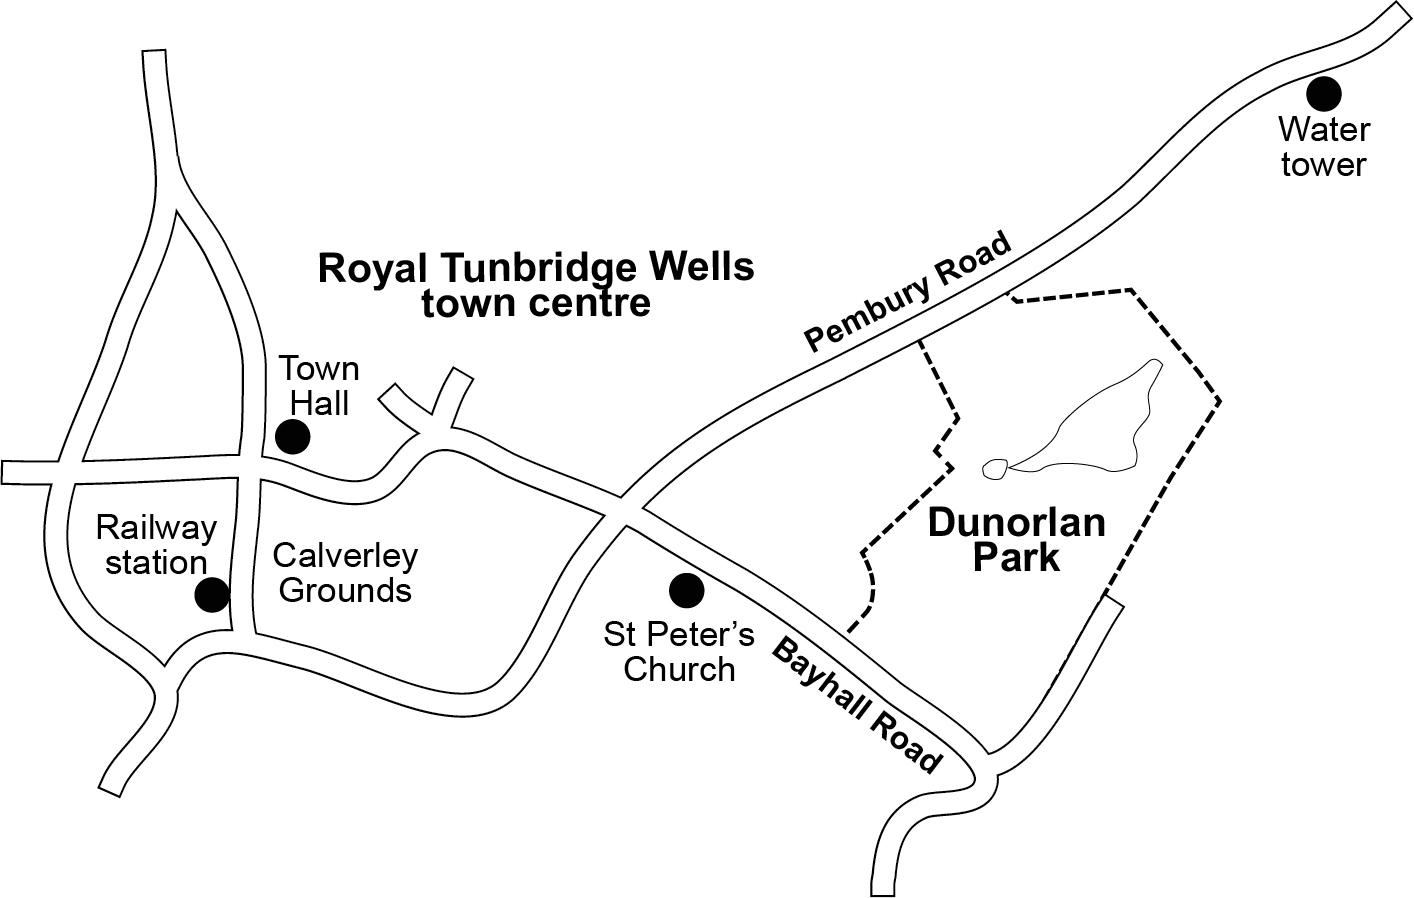 Location of Dunorlan Park